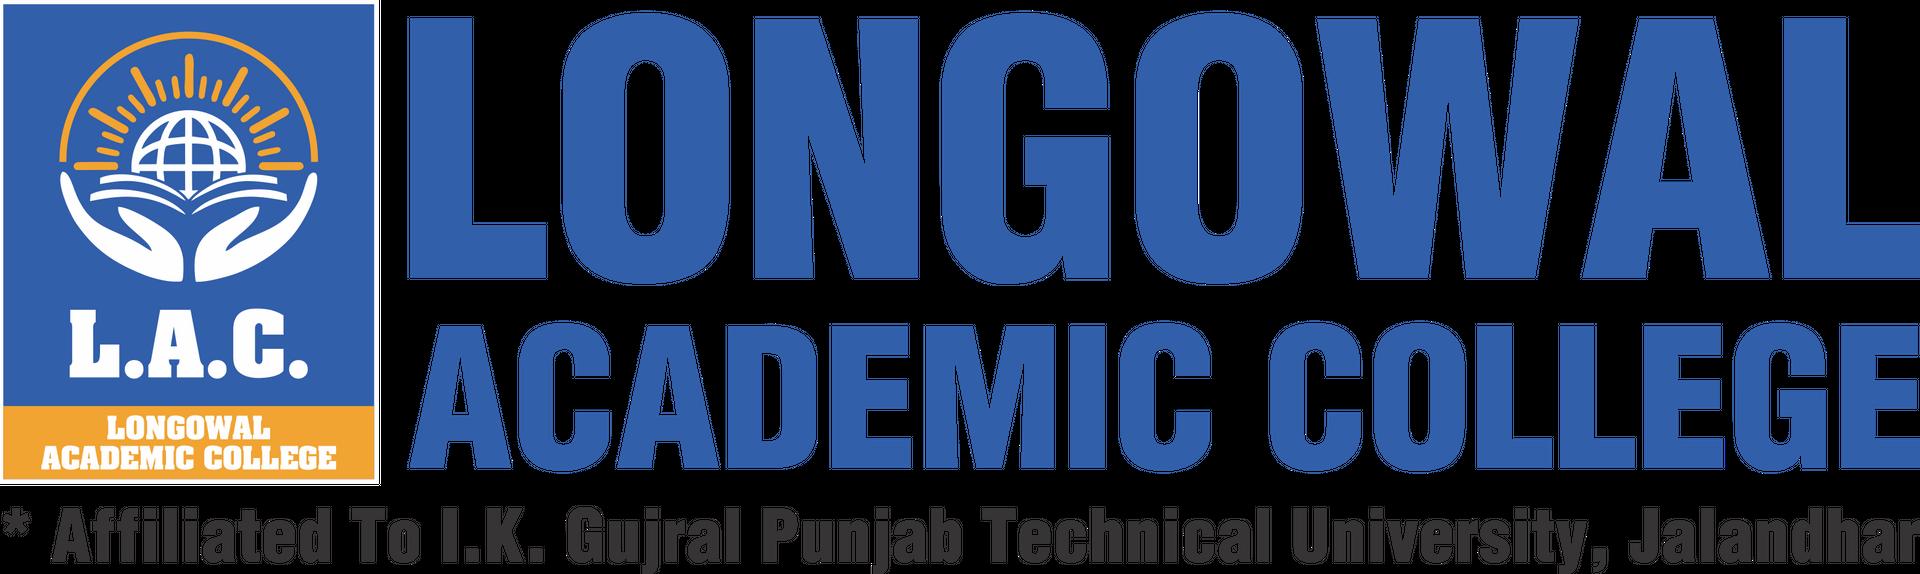 Longowal Academic College